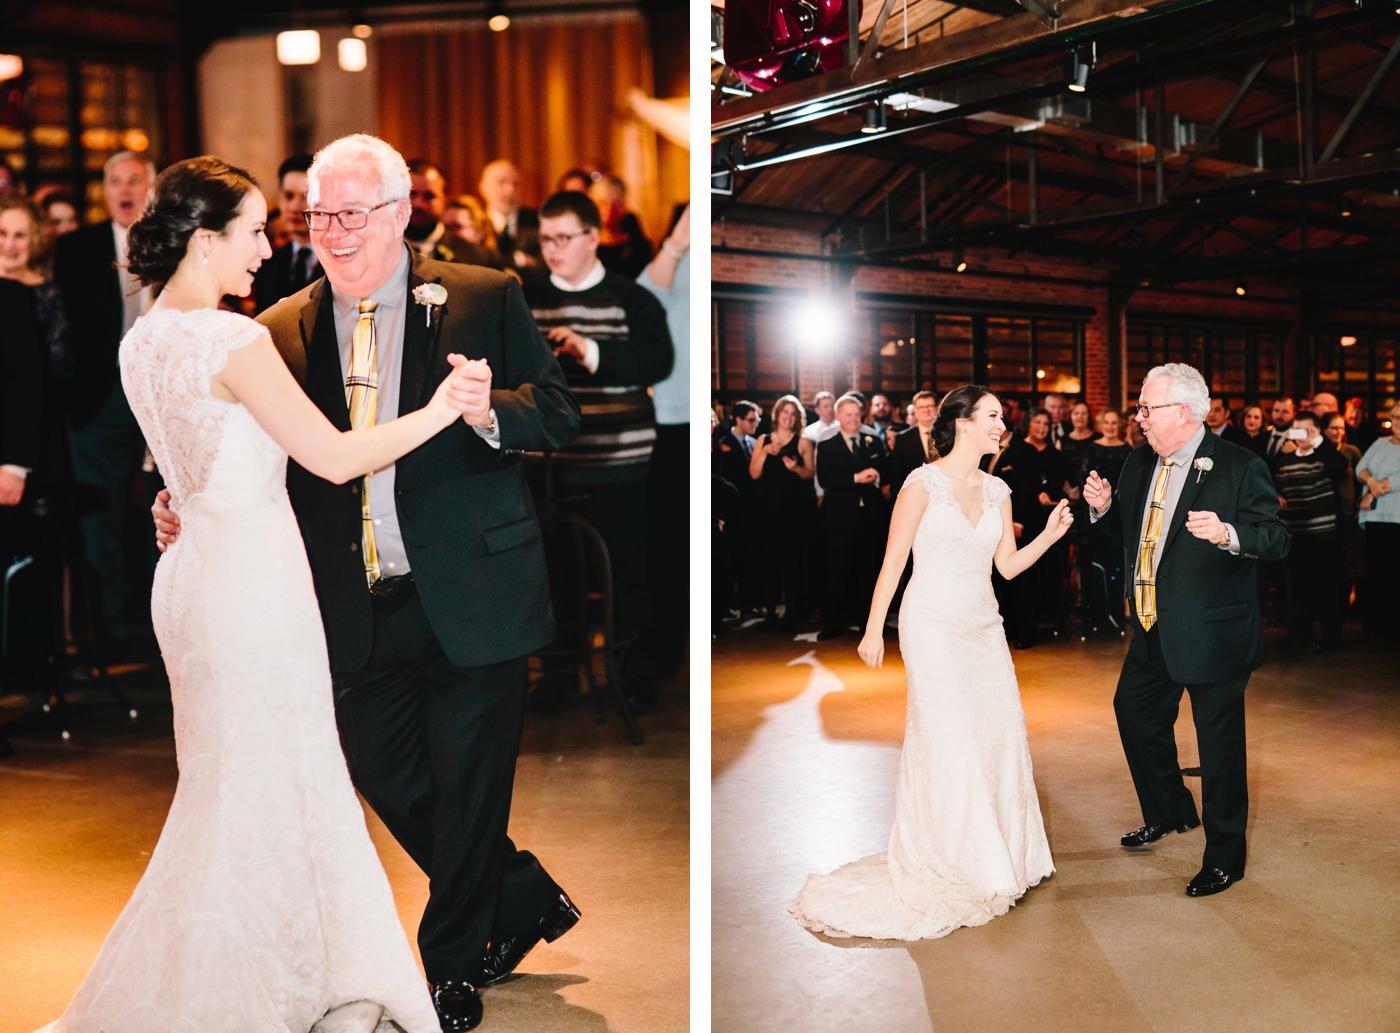 chicago-fine-art-wedding-photography-lintelman49